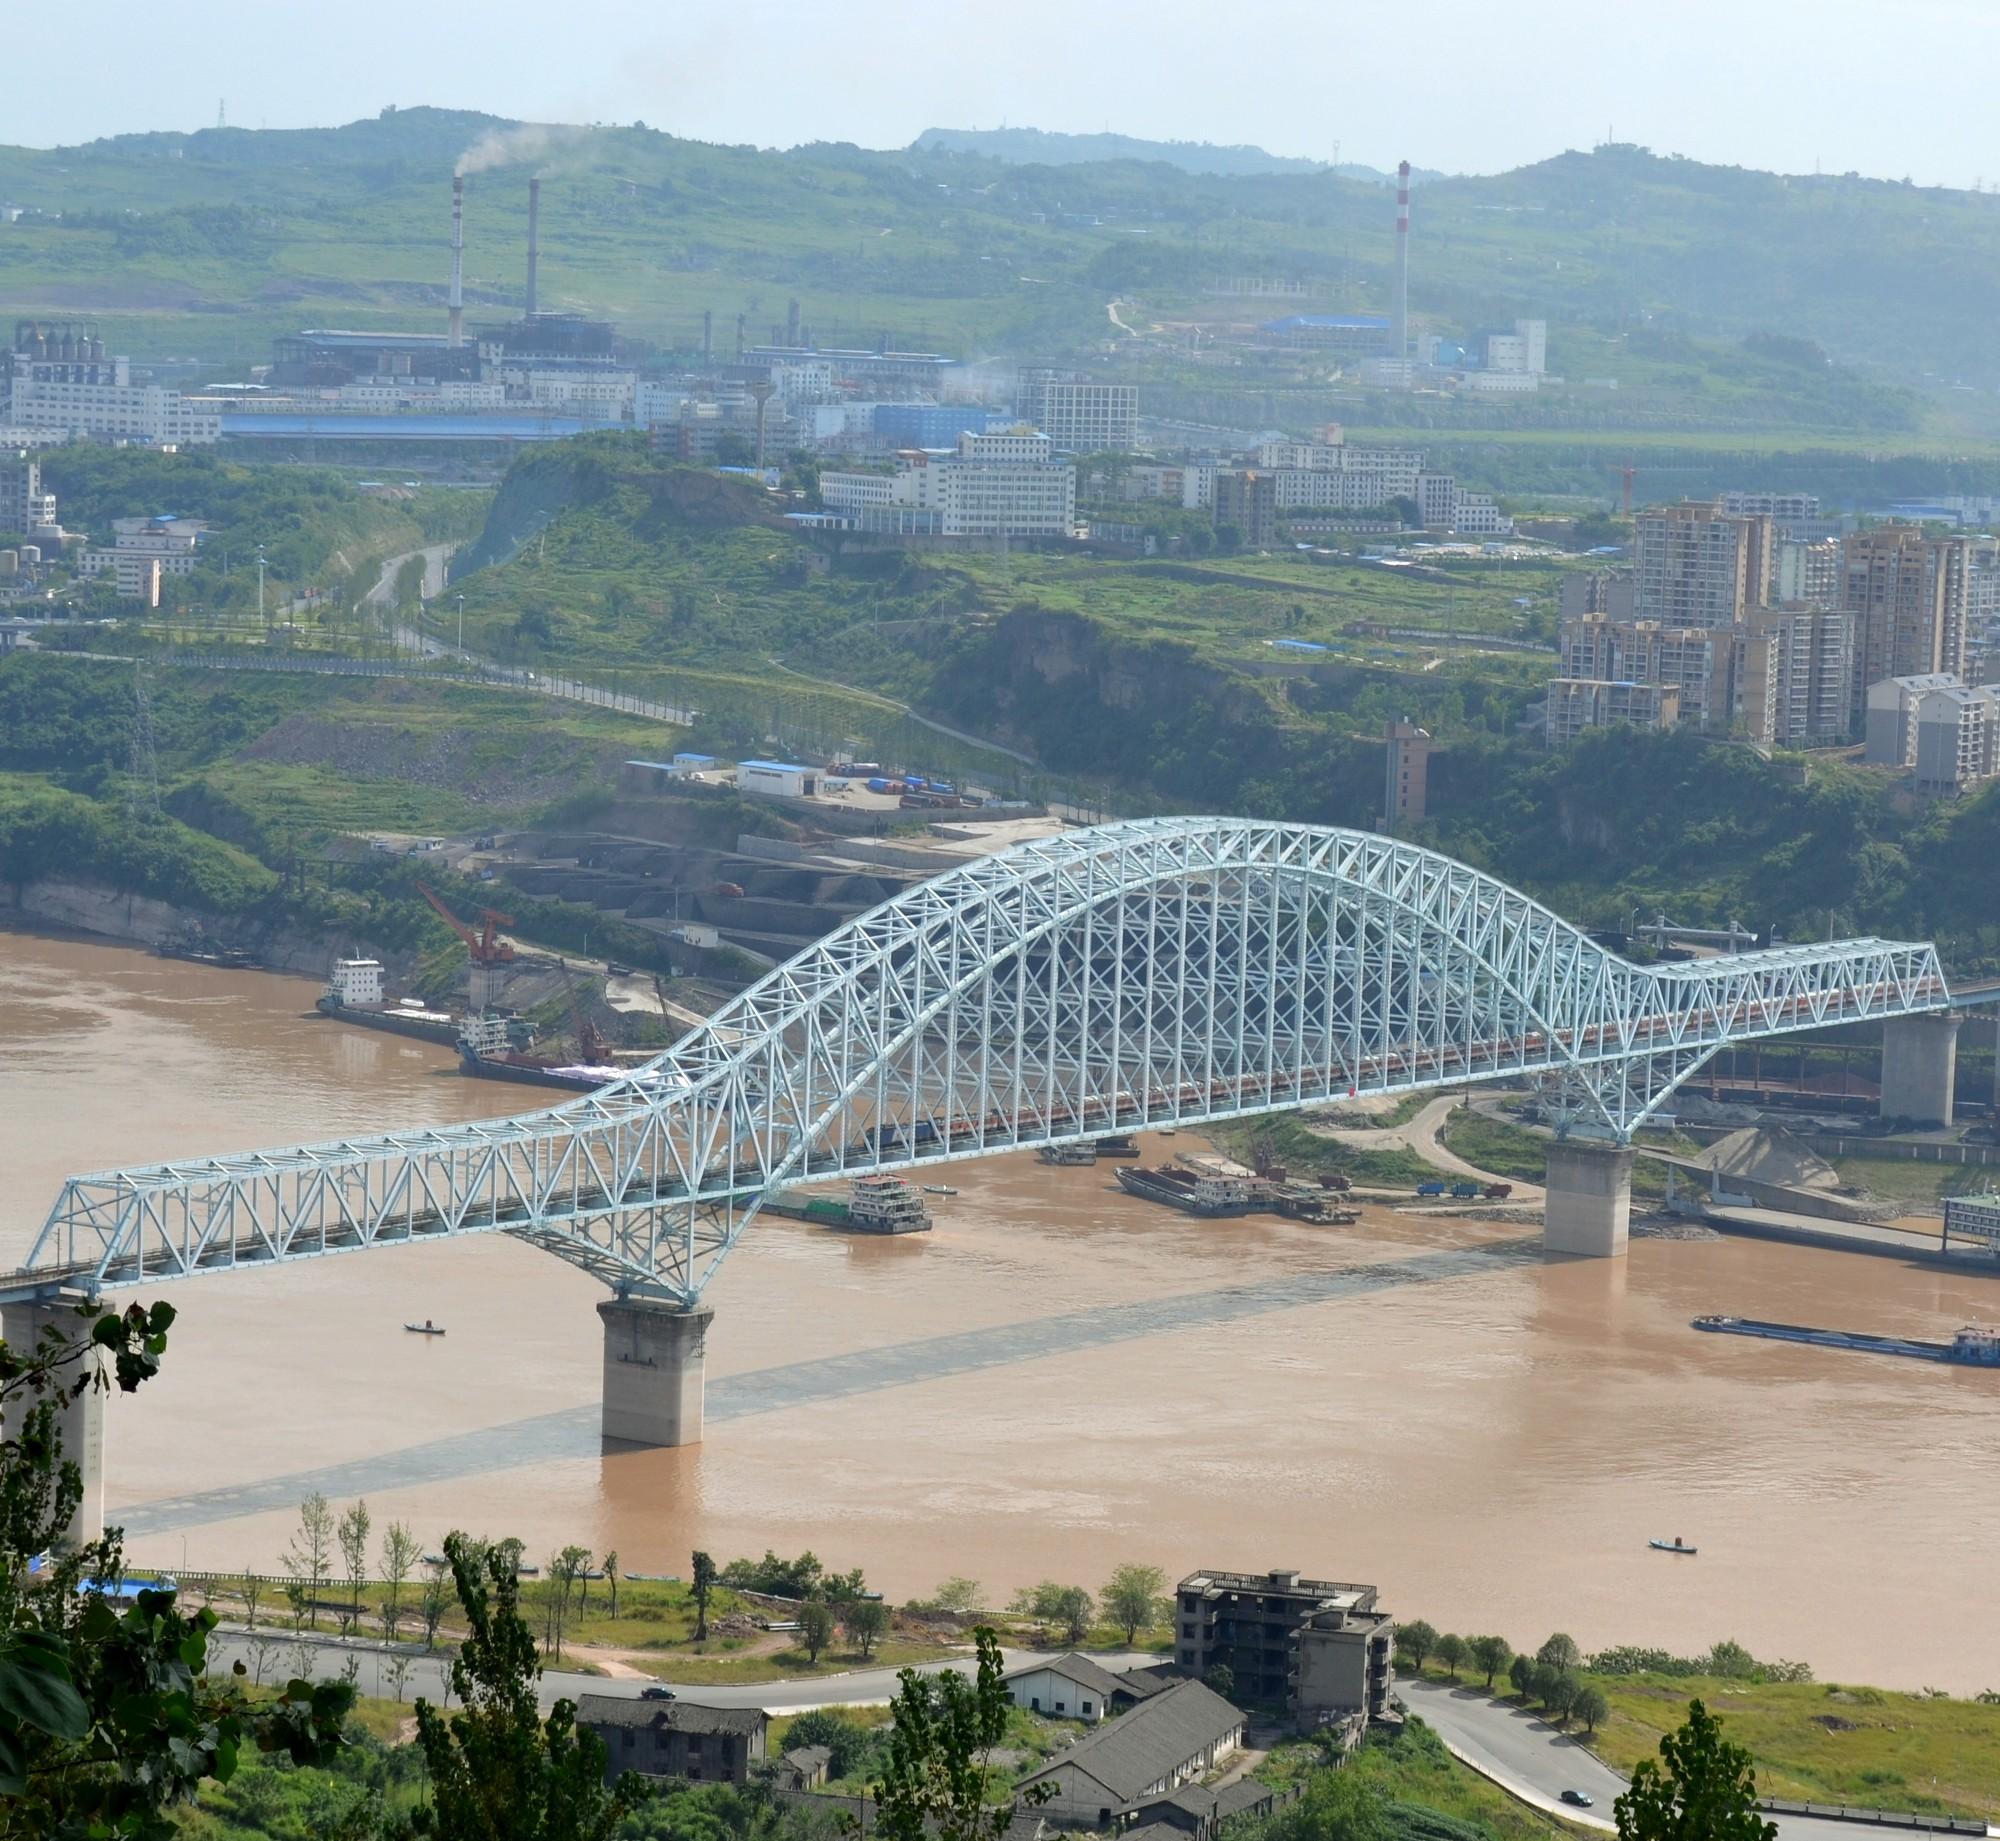 http://upload.wikimedia.org/wikipedia/commons/7/7b/Wanzhou_Yangtze_River_Railway_Bridge1.JPG